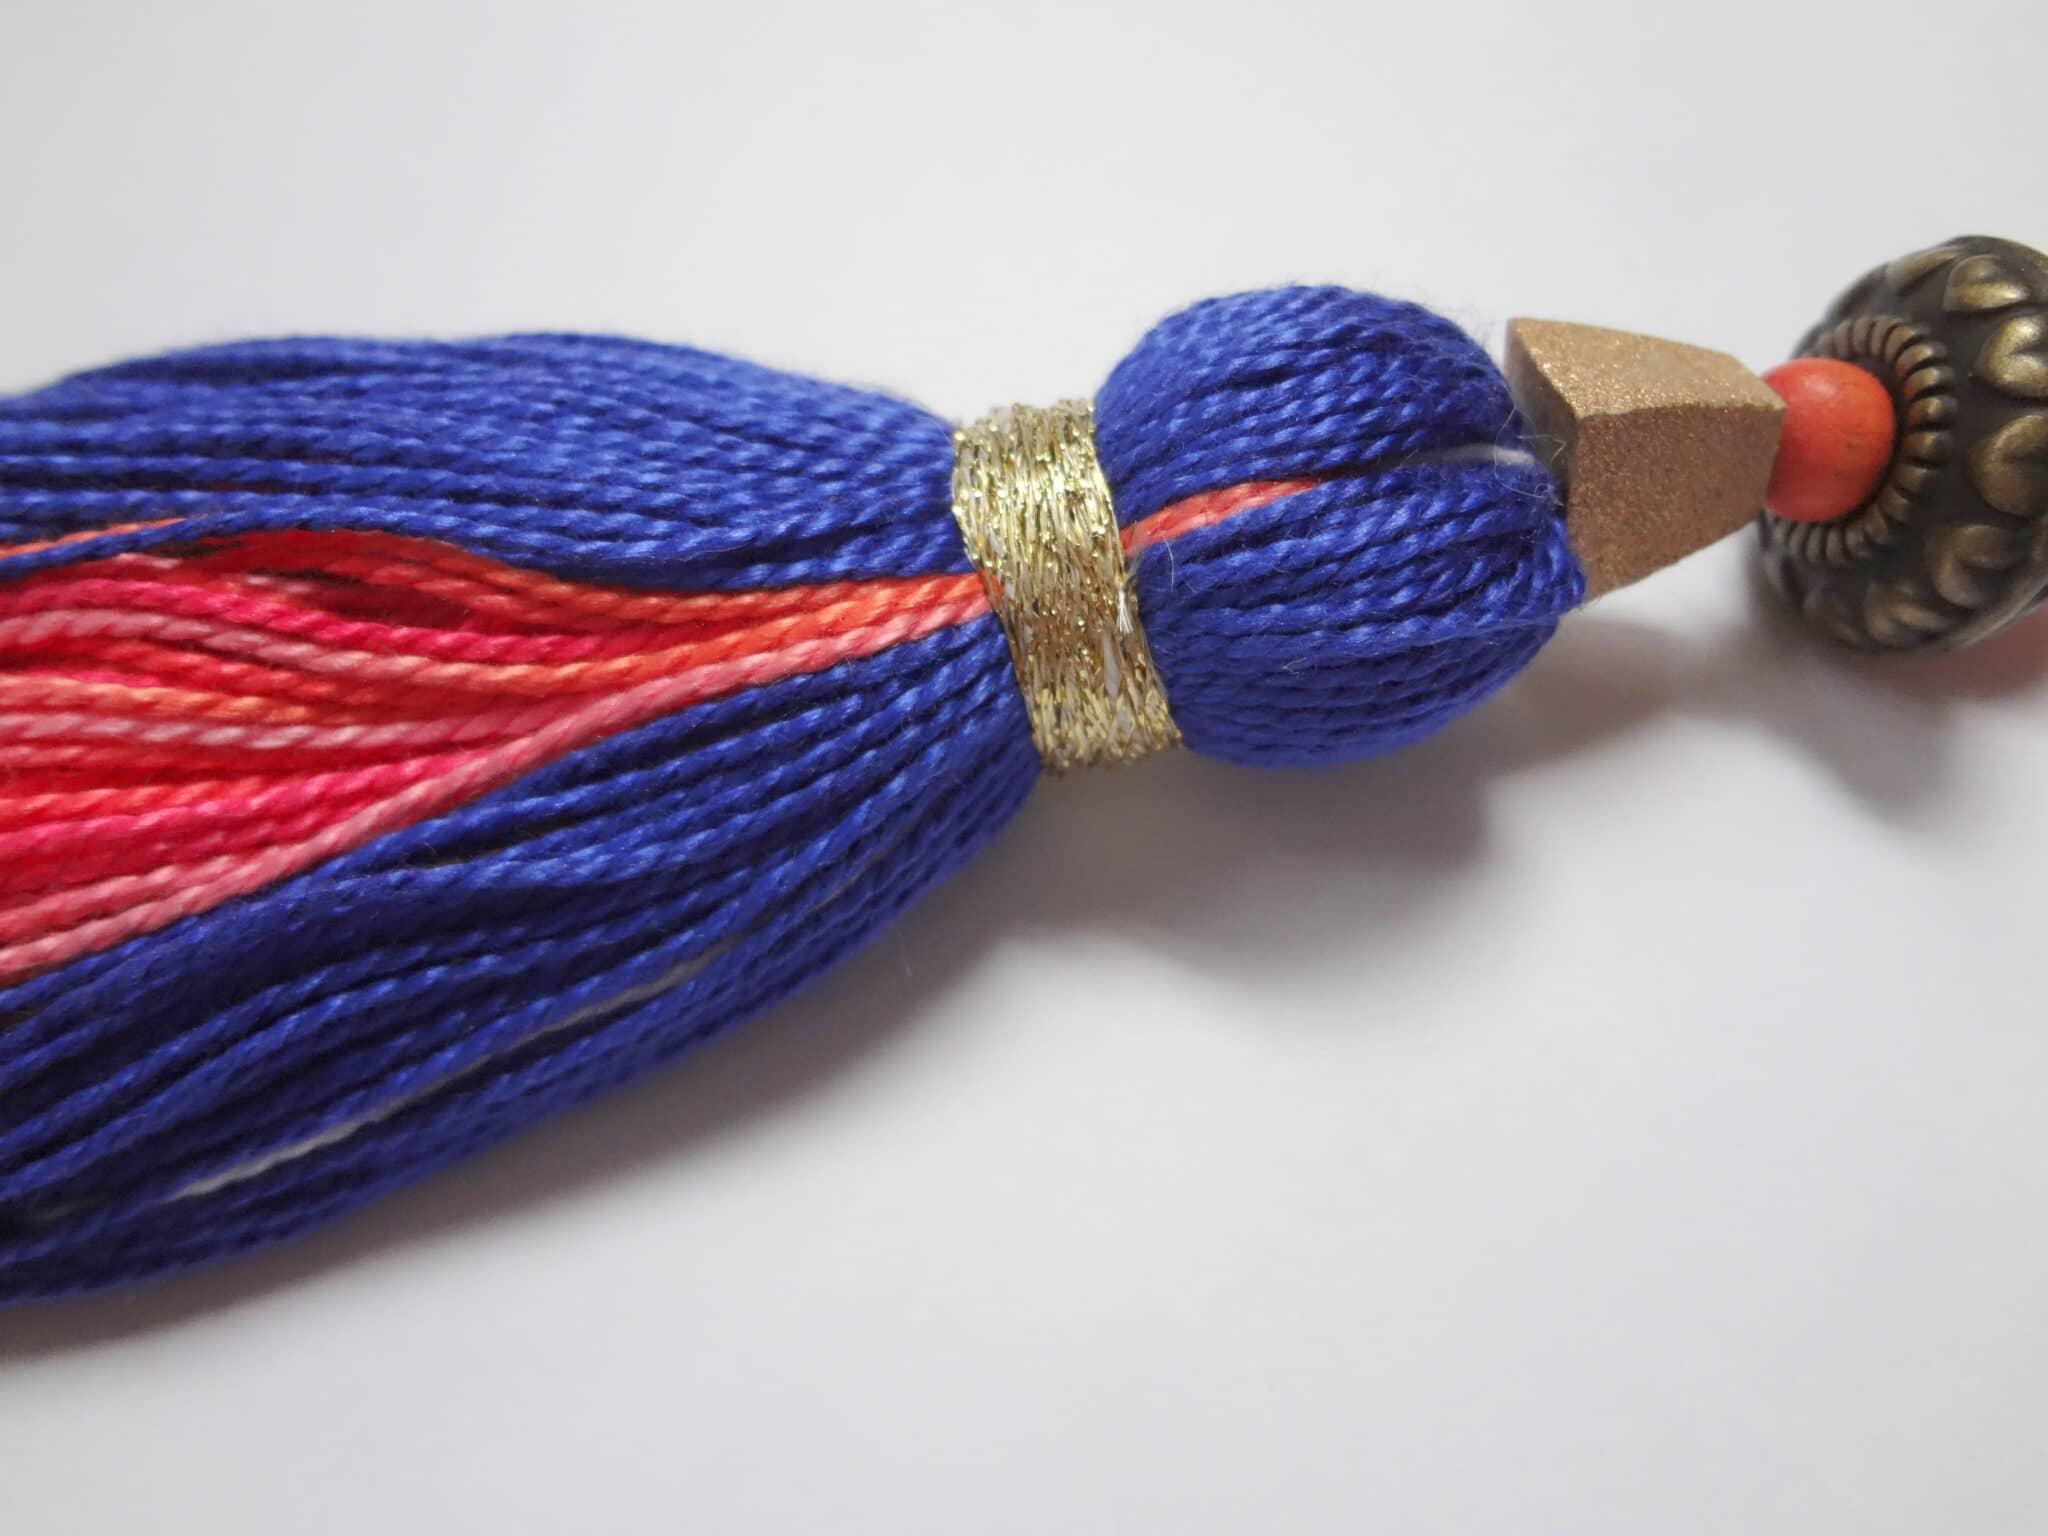 Wrap metallic floss on tassel